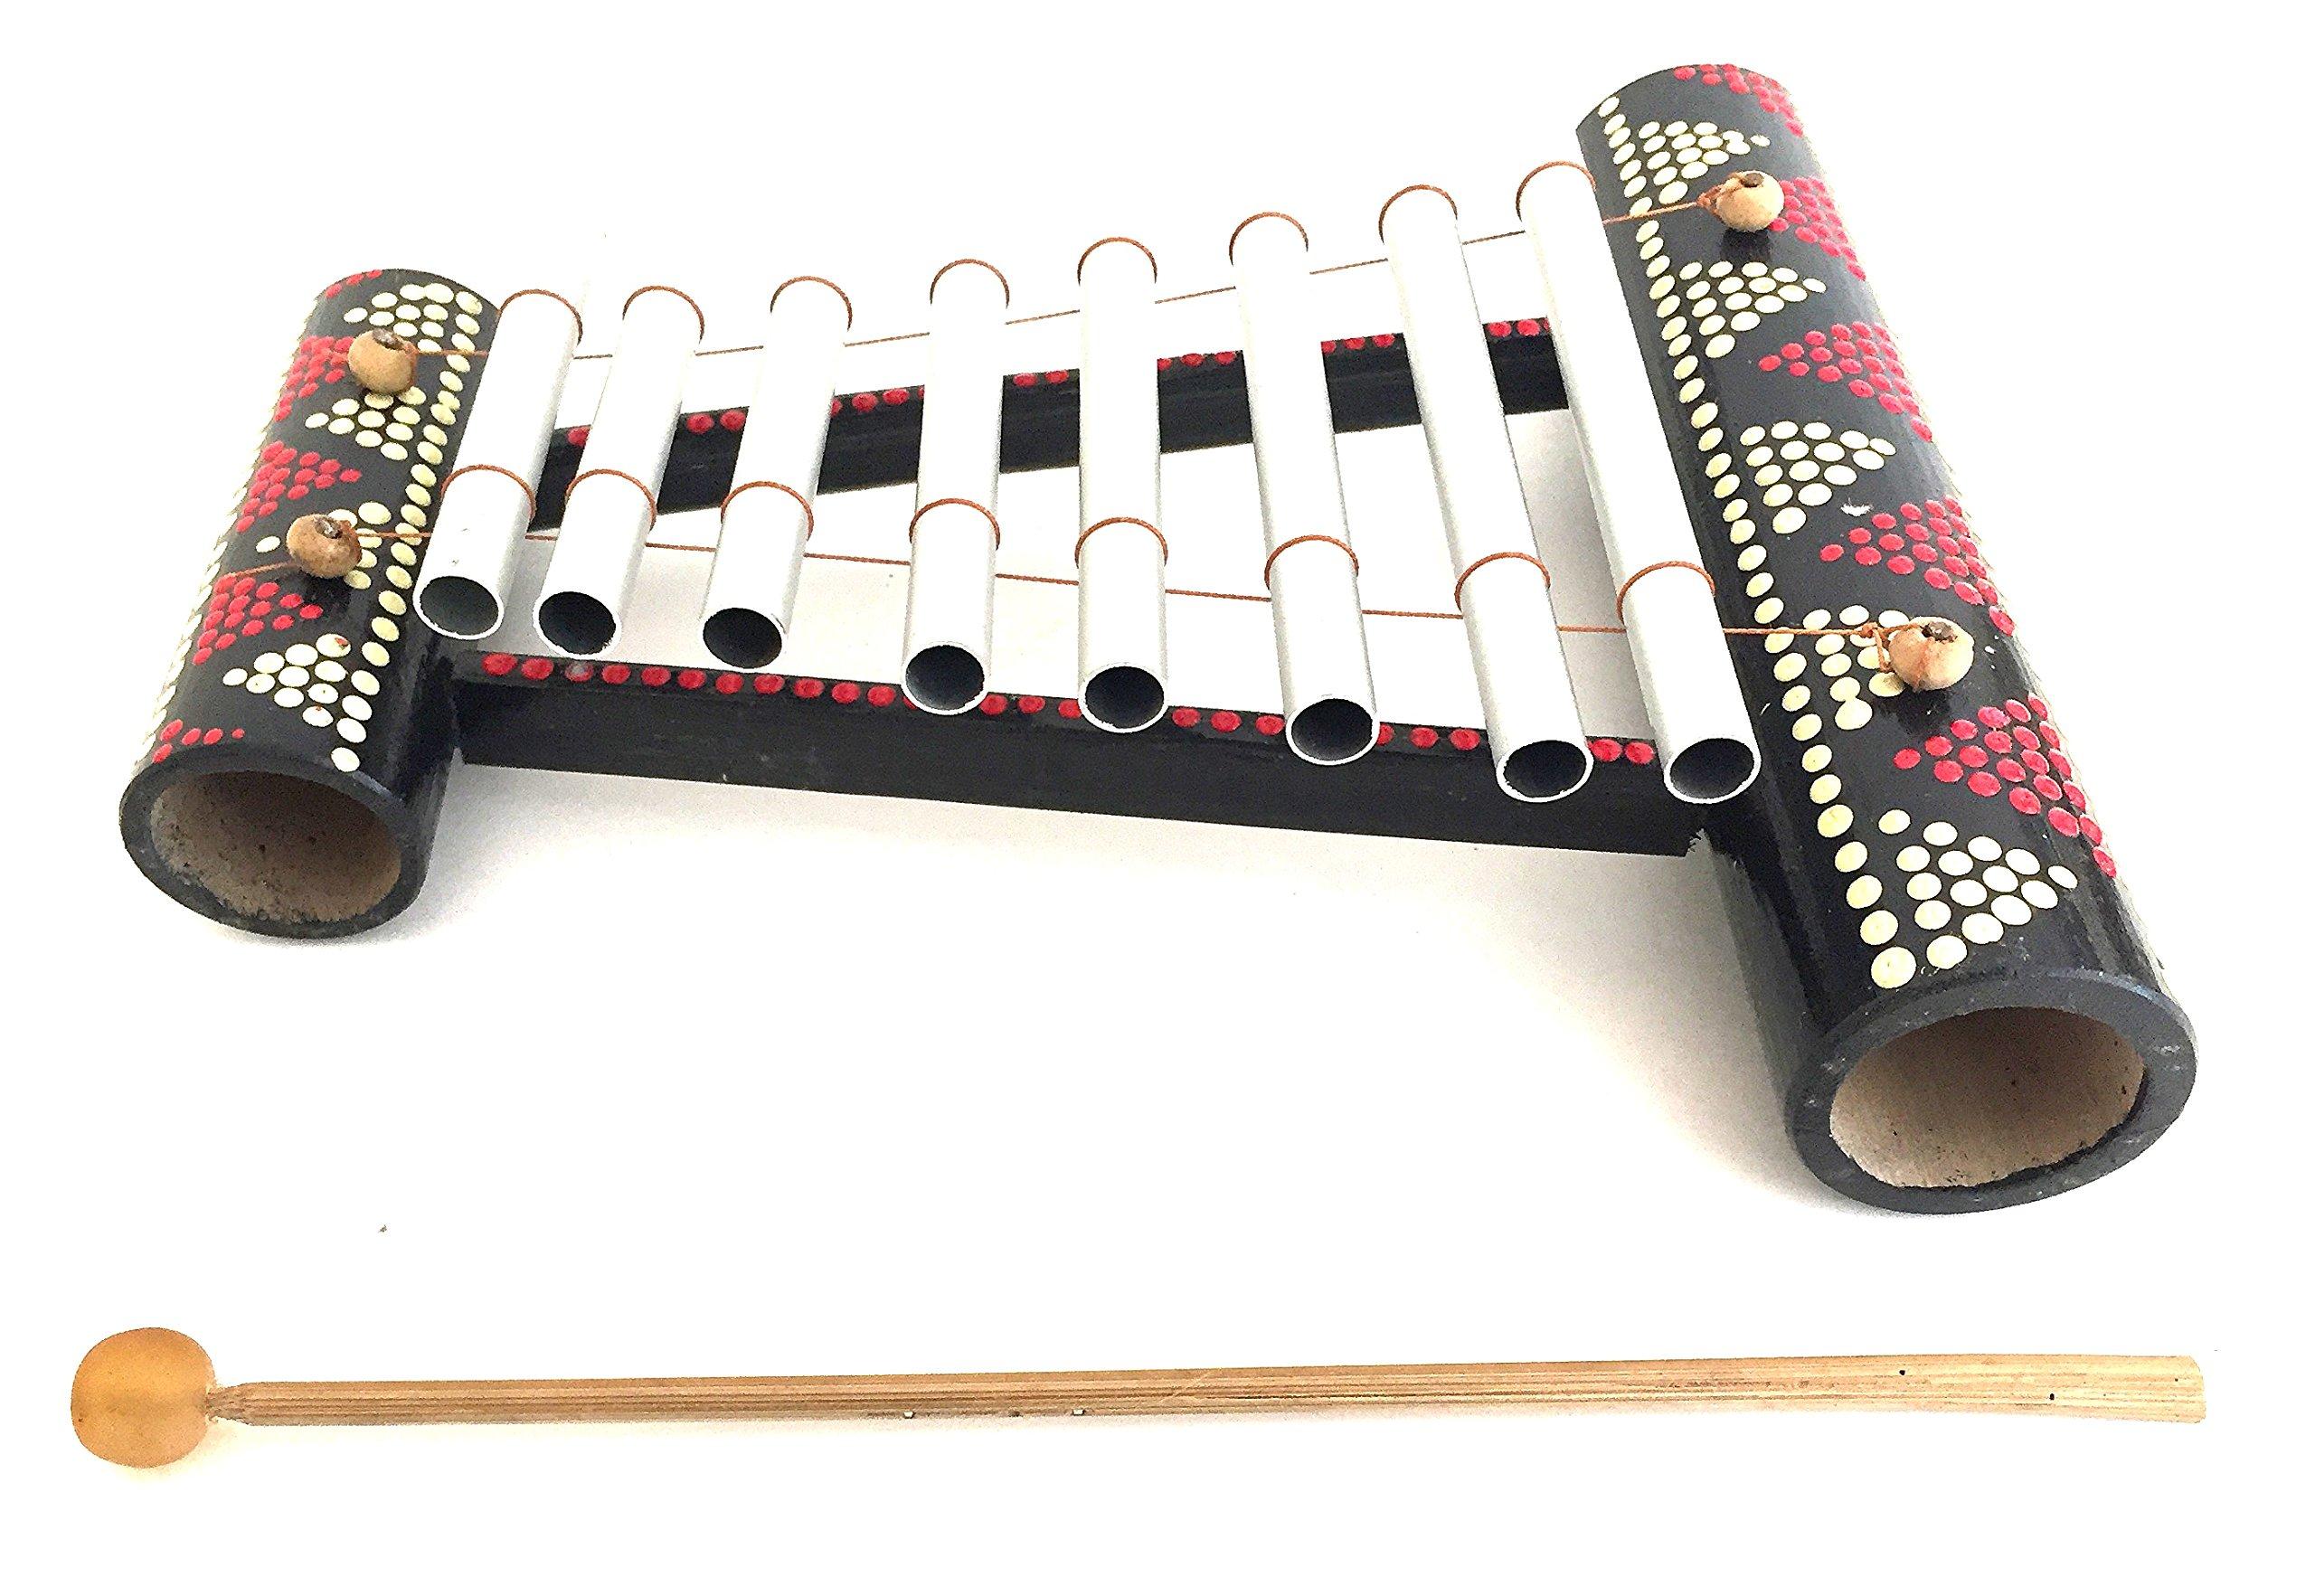 Bamboo Xylophone Energy Meditation Chime Hand Painted Nice Sound - JIVE BRAND by Jive